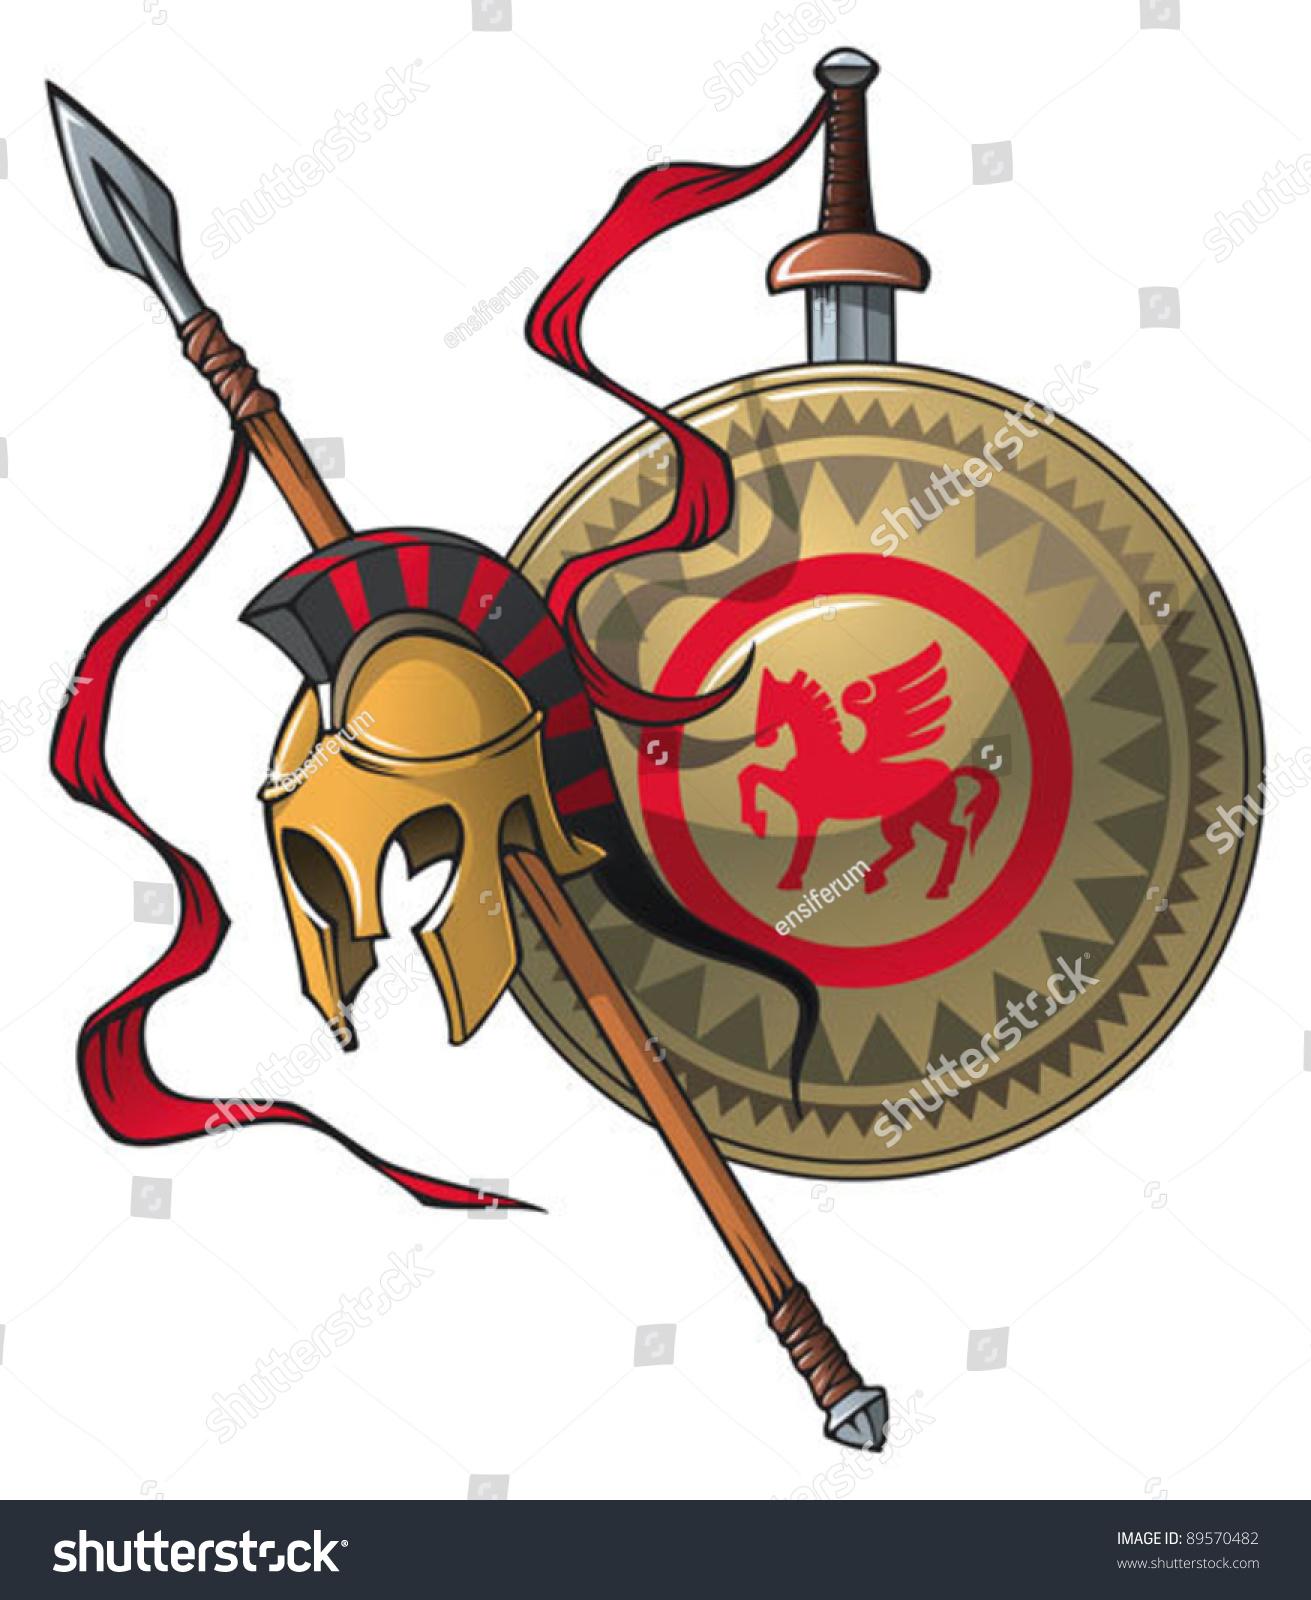 Greek Coat Arms Helmet Spear Sword Stock Vector Royalty Free